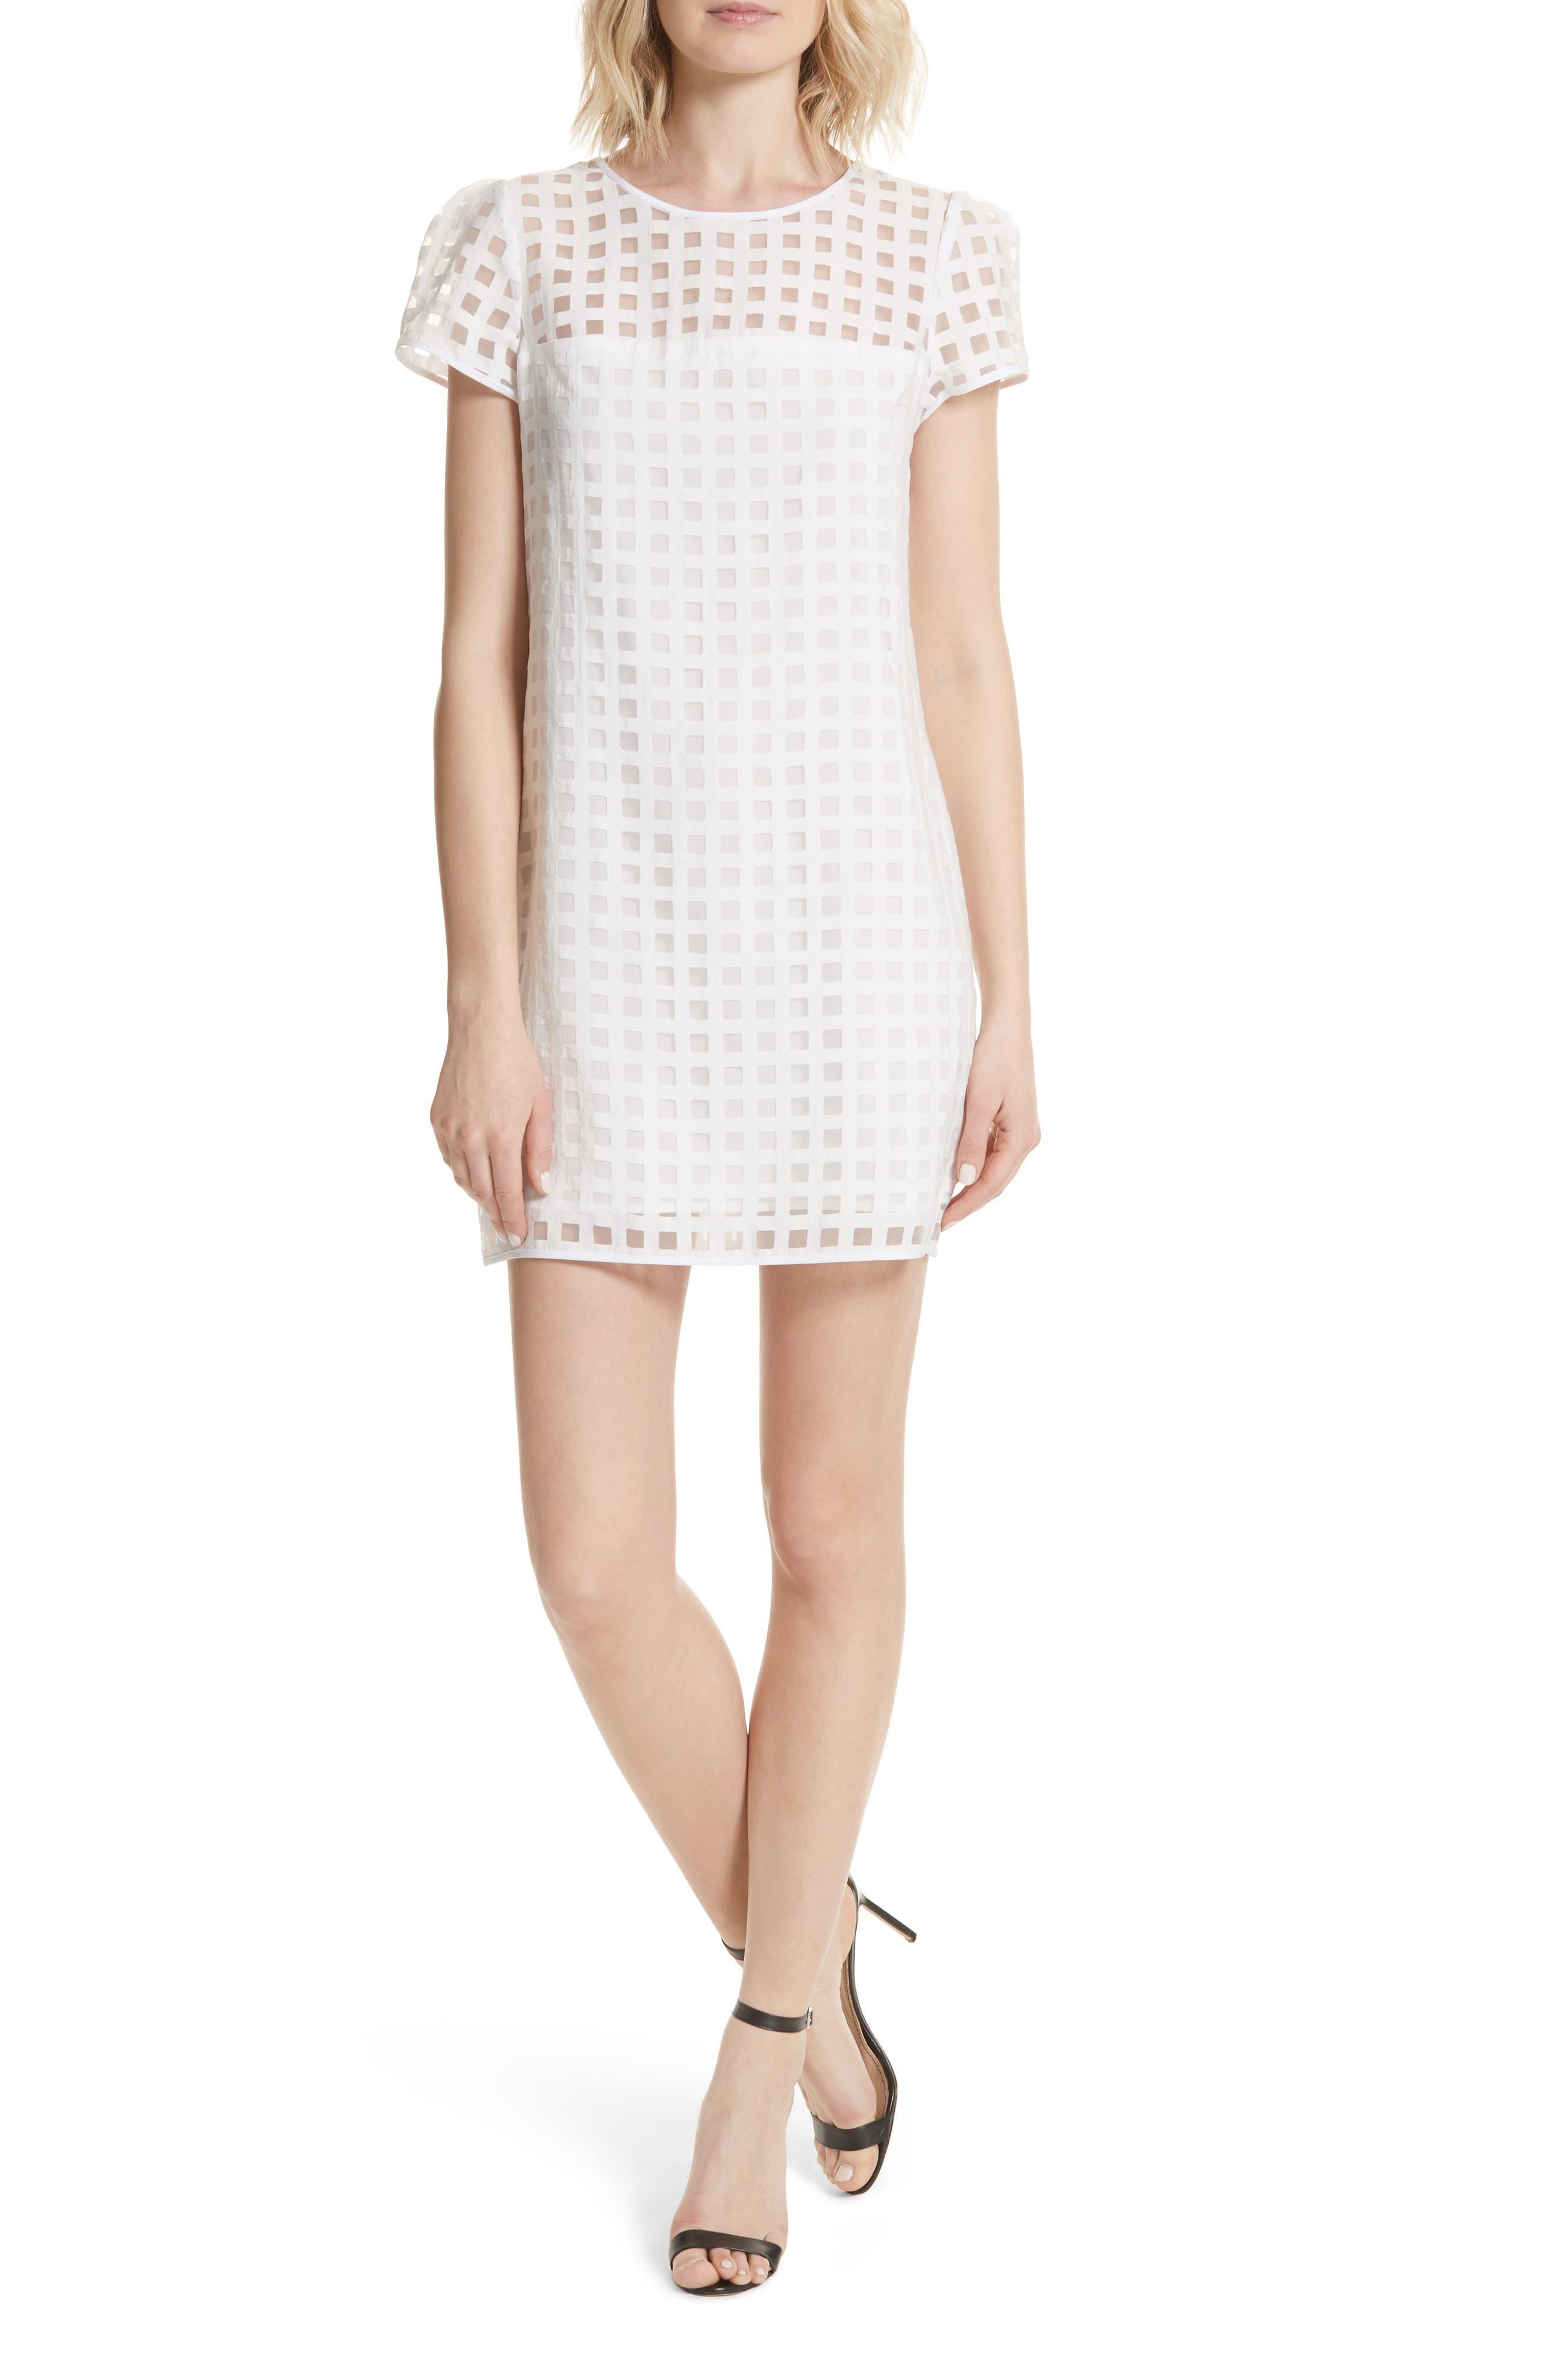 Chloe Illusion Check Shift Dress,                         Main,                         color, White